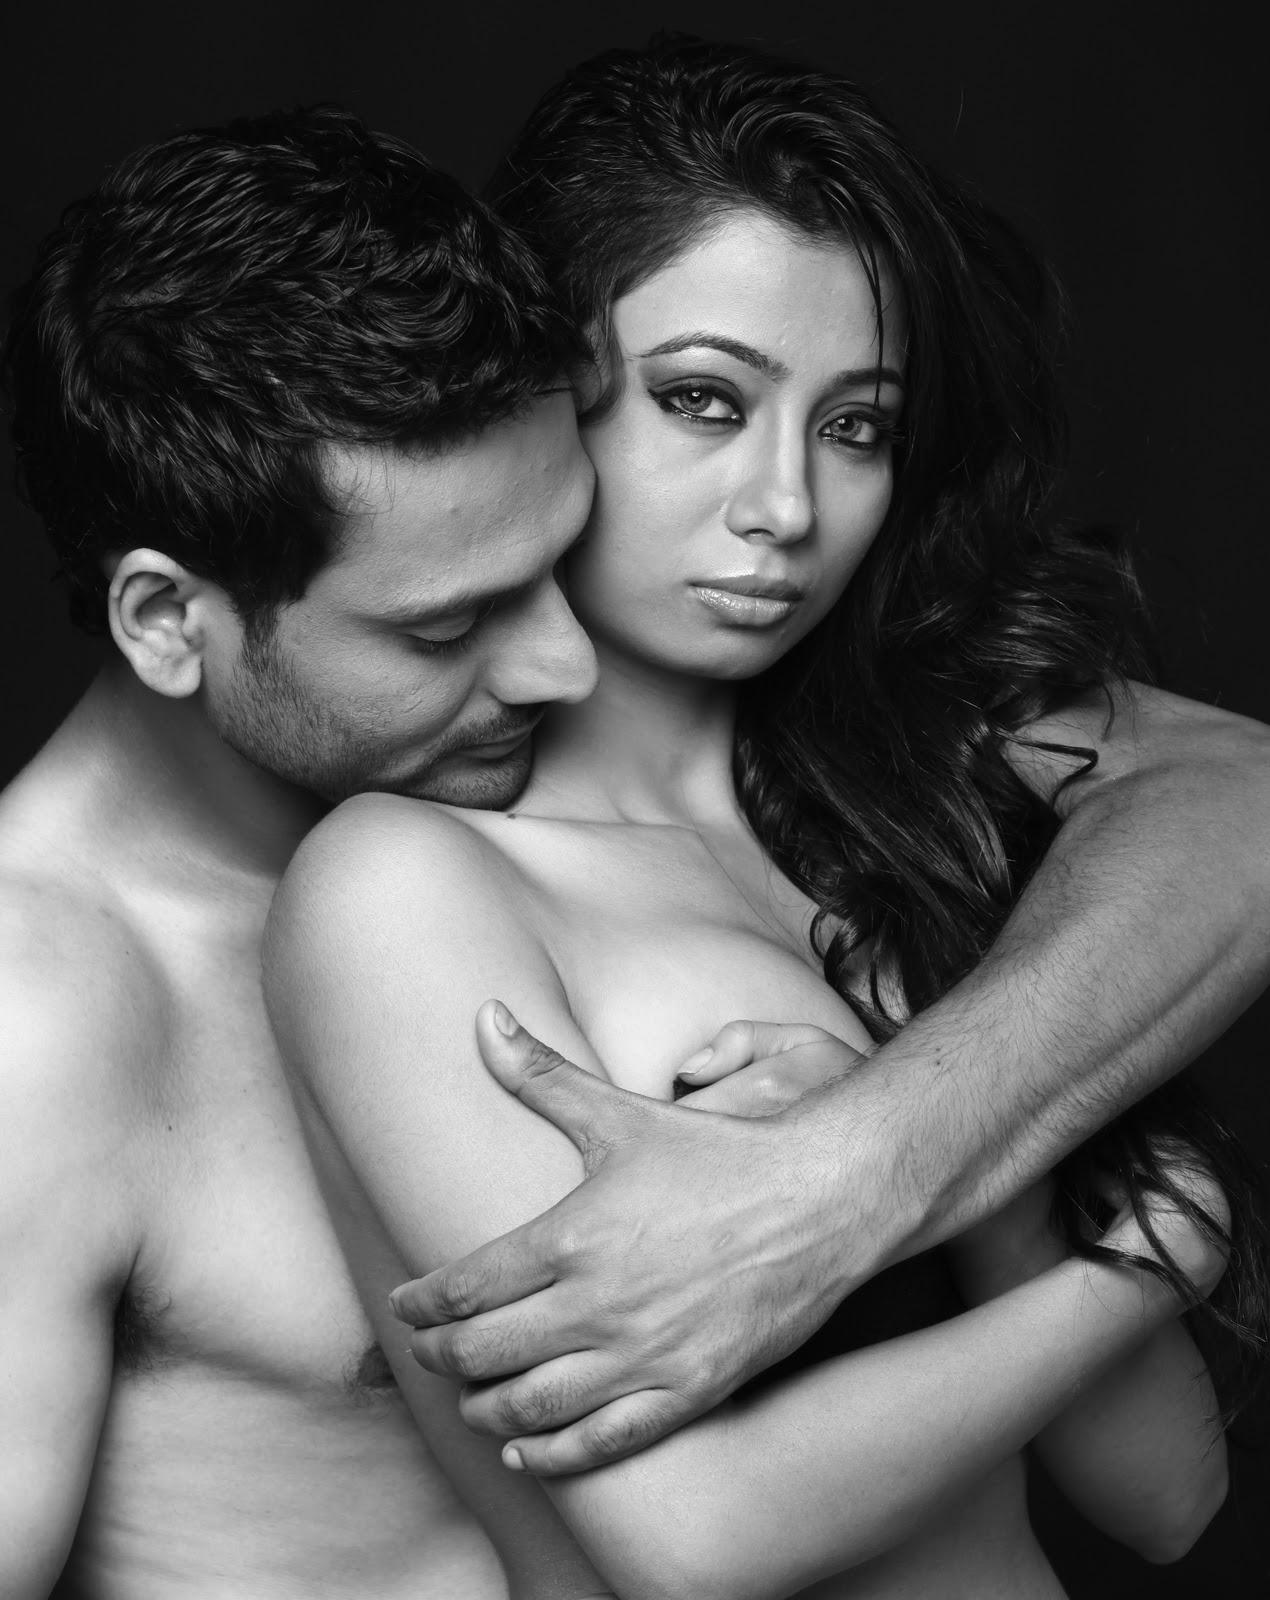 Nina Kodaka (b. 1989),Dana Vespoli Erotic movies Simon Russell Beale (born 1961 (born in Penang, Malaysia),Vera Lewis